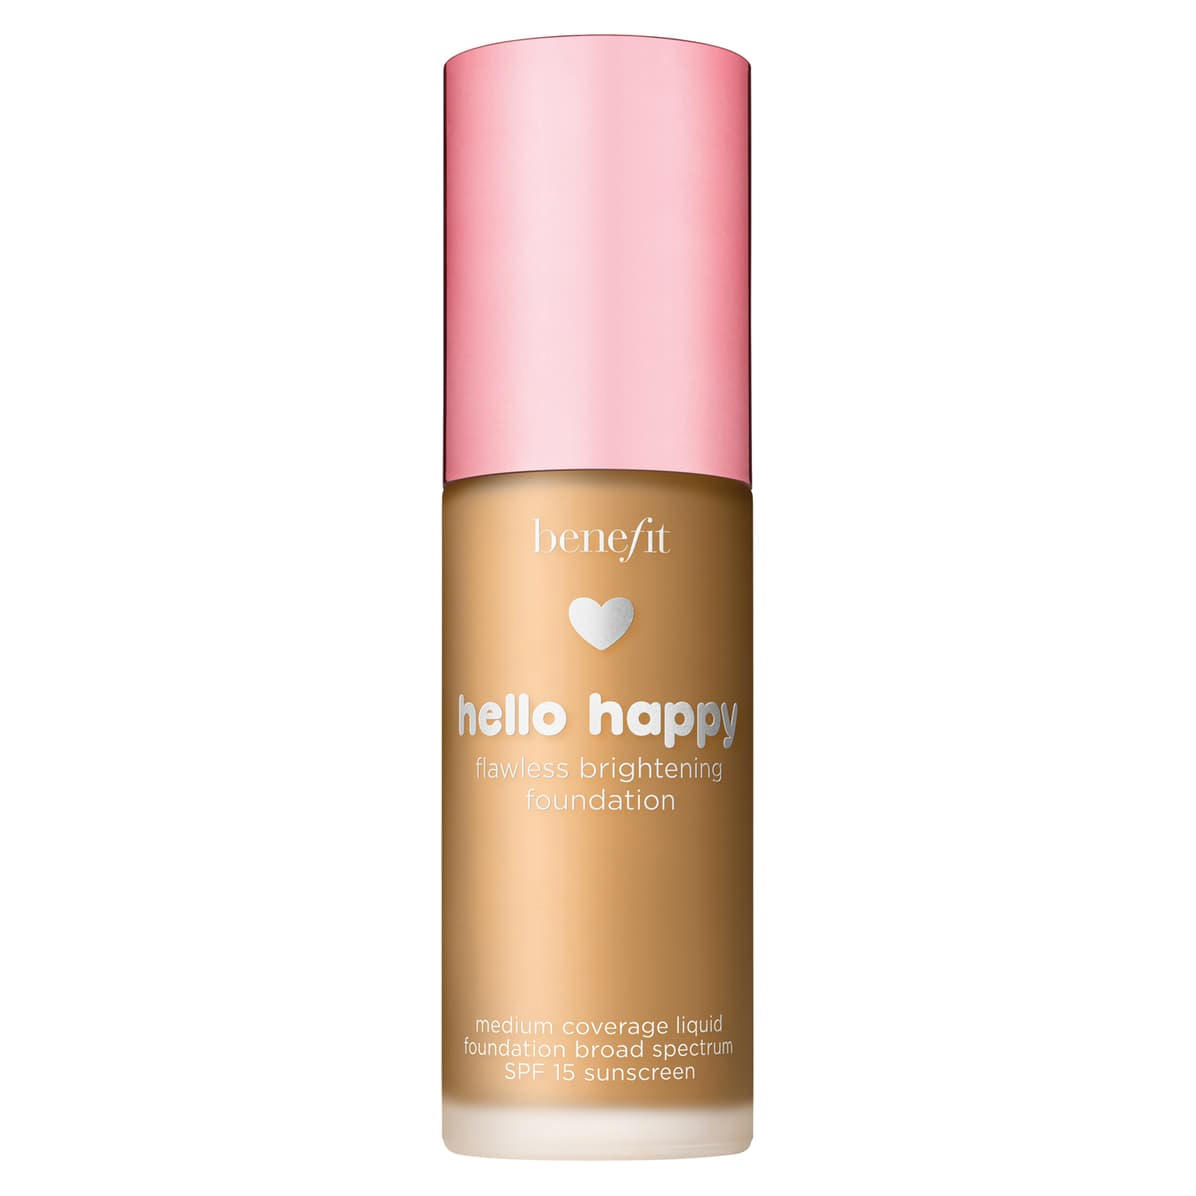 Benefit Hello Happy Flawless Brightening Foundation 5